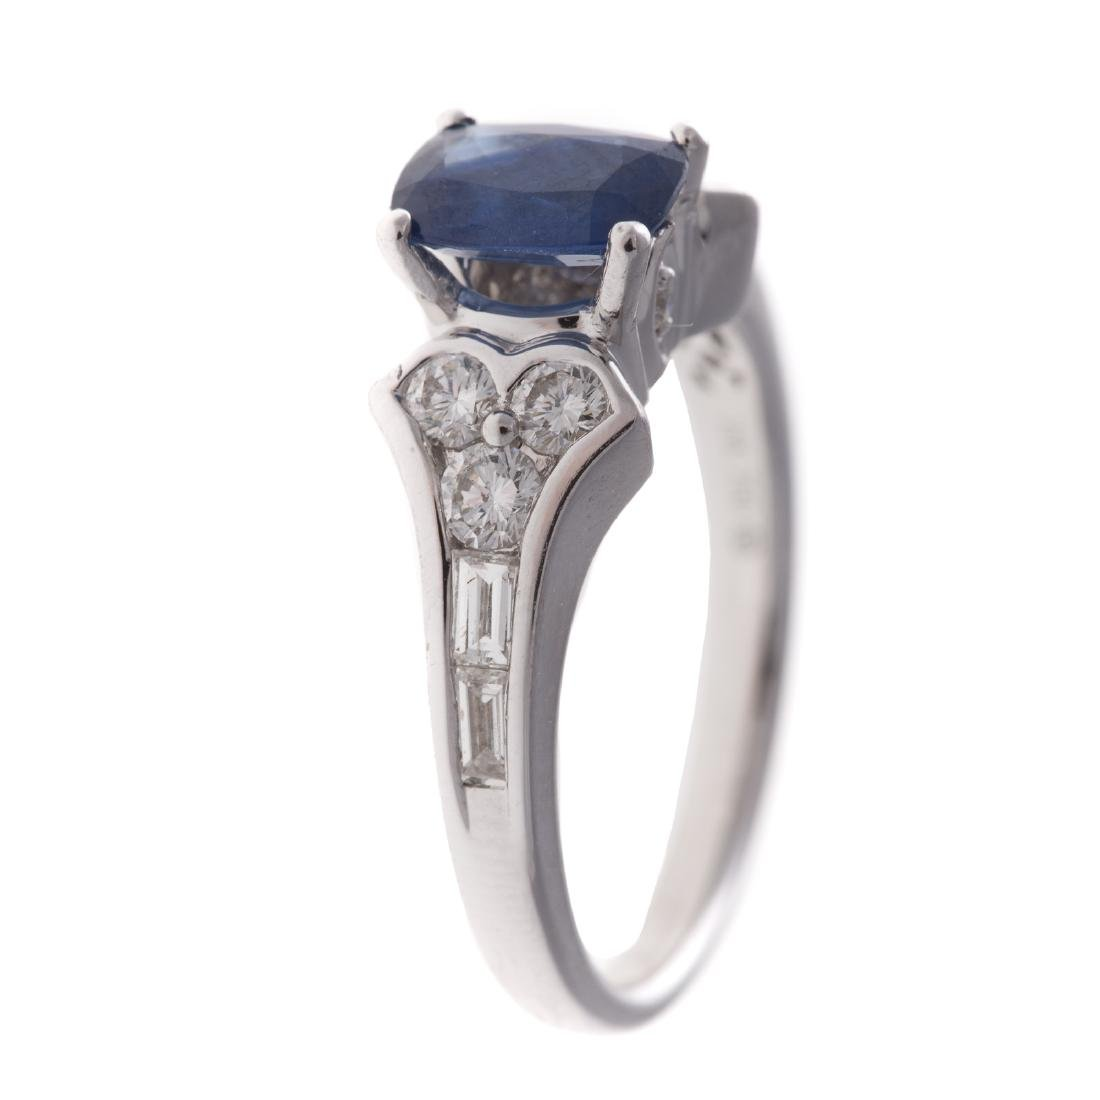 A Lady's 18K Sapphire & Diamond Ring - 2